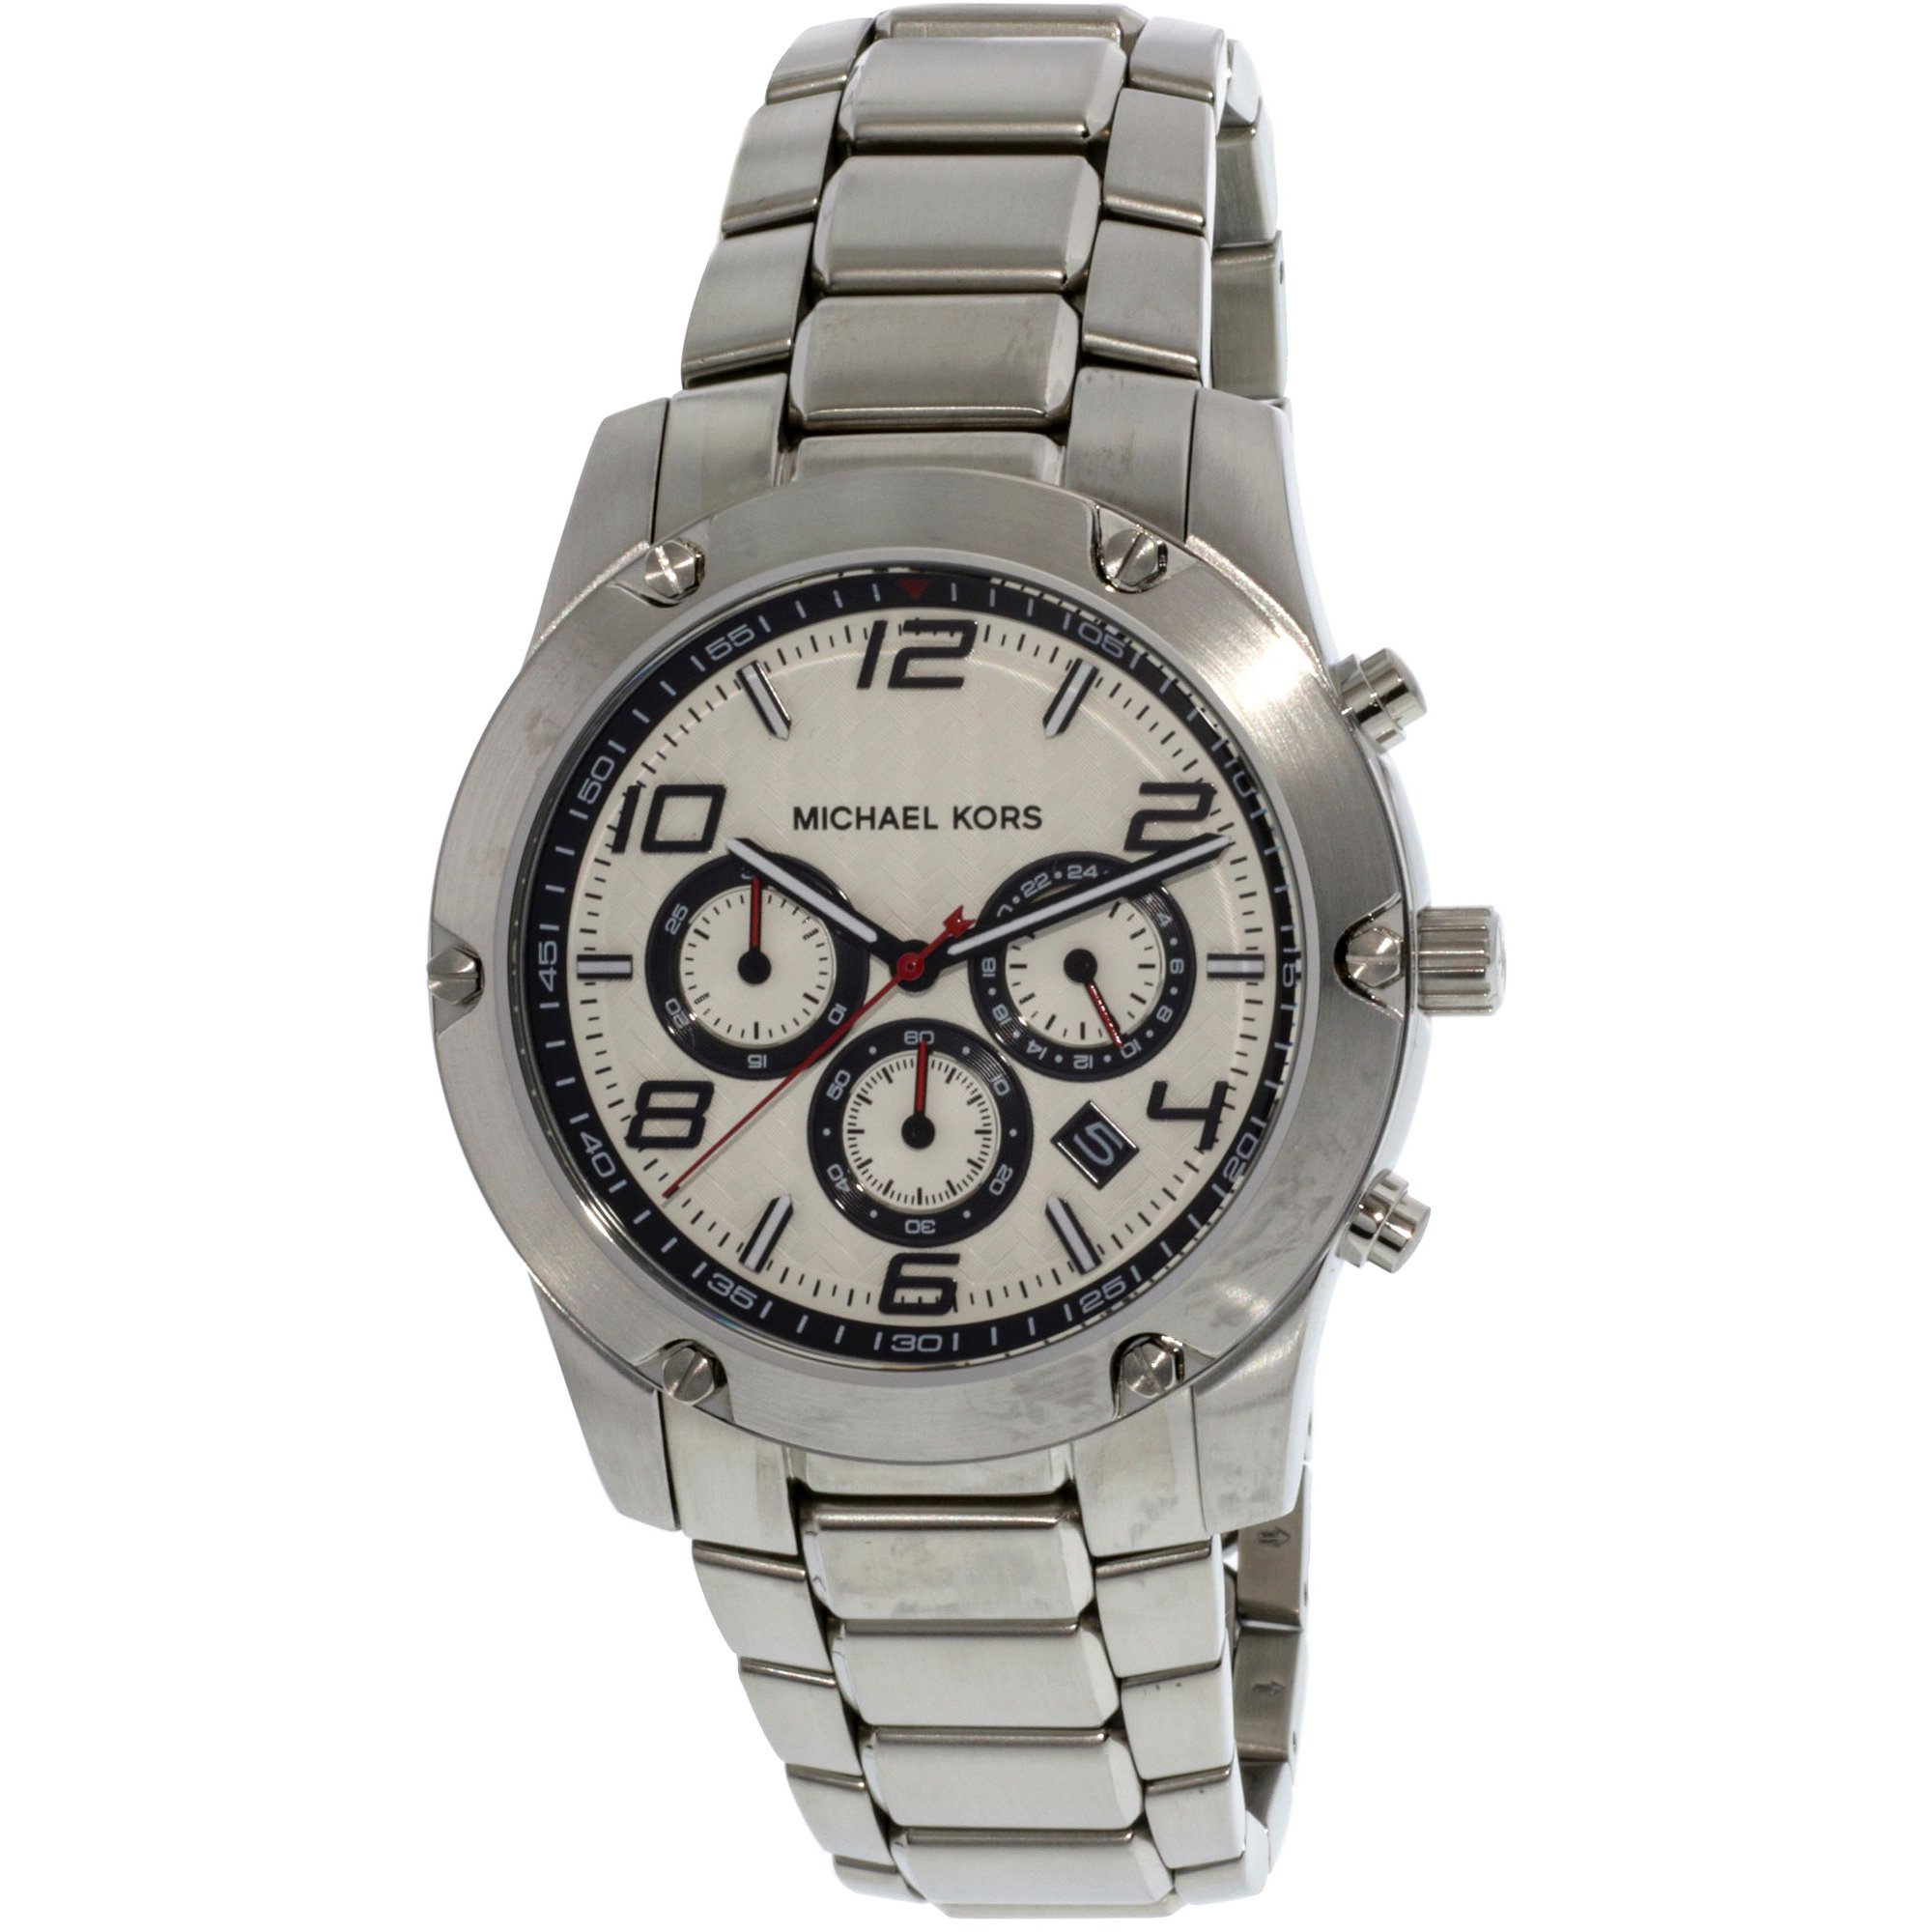 63afc060838c Michael Kors Men s Caine MK8472 Silver Stainless-Steel Plated Japanese  Quartz Dress Watch